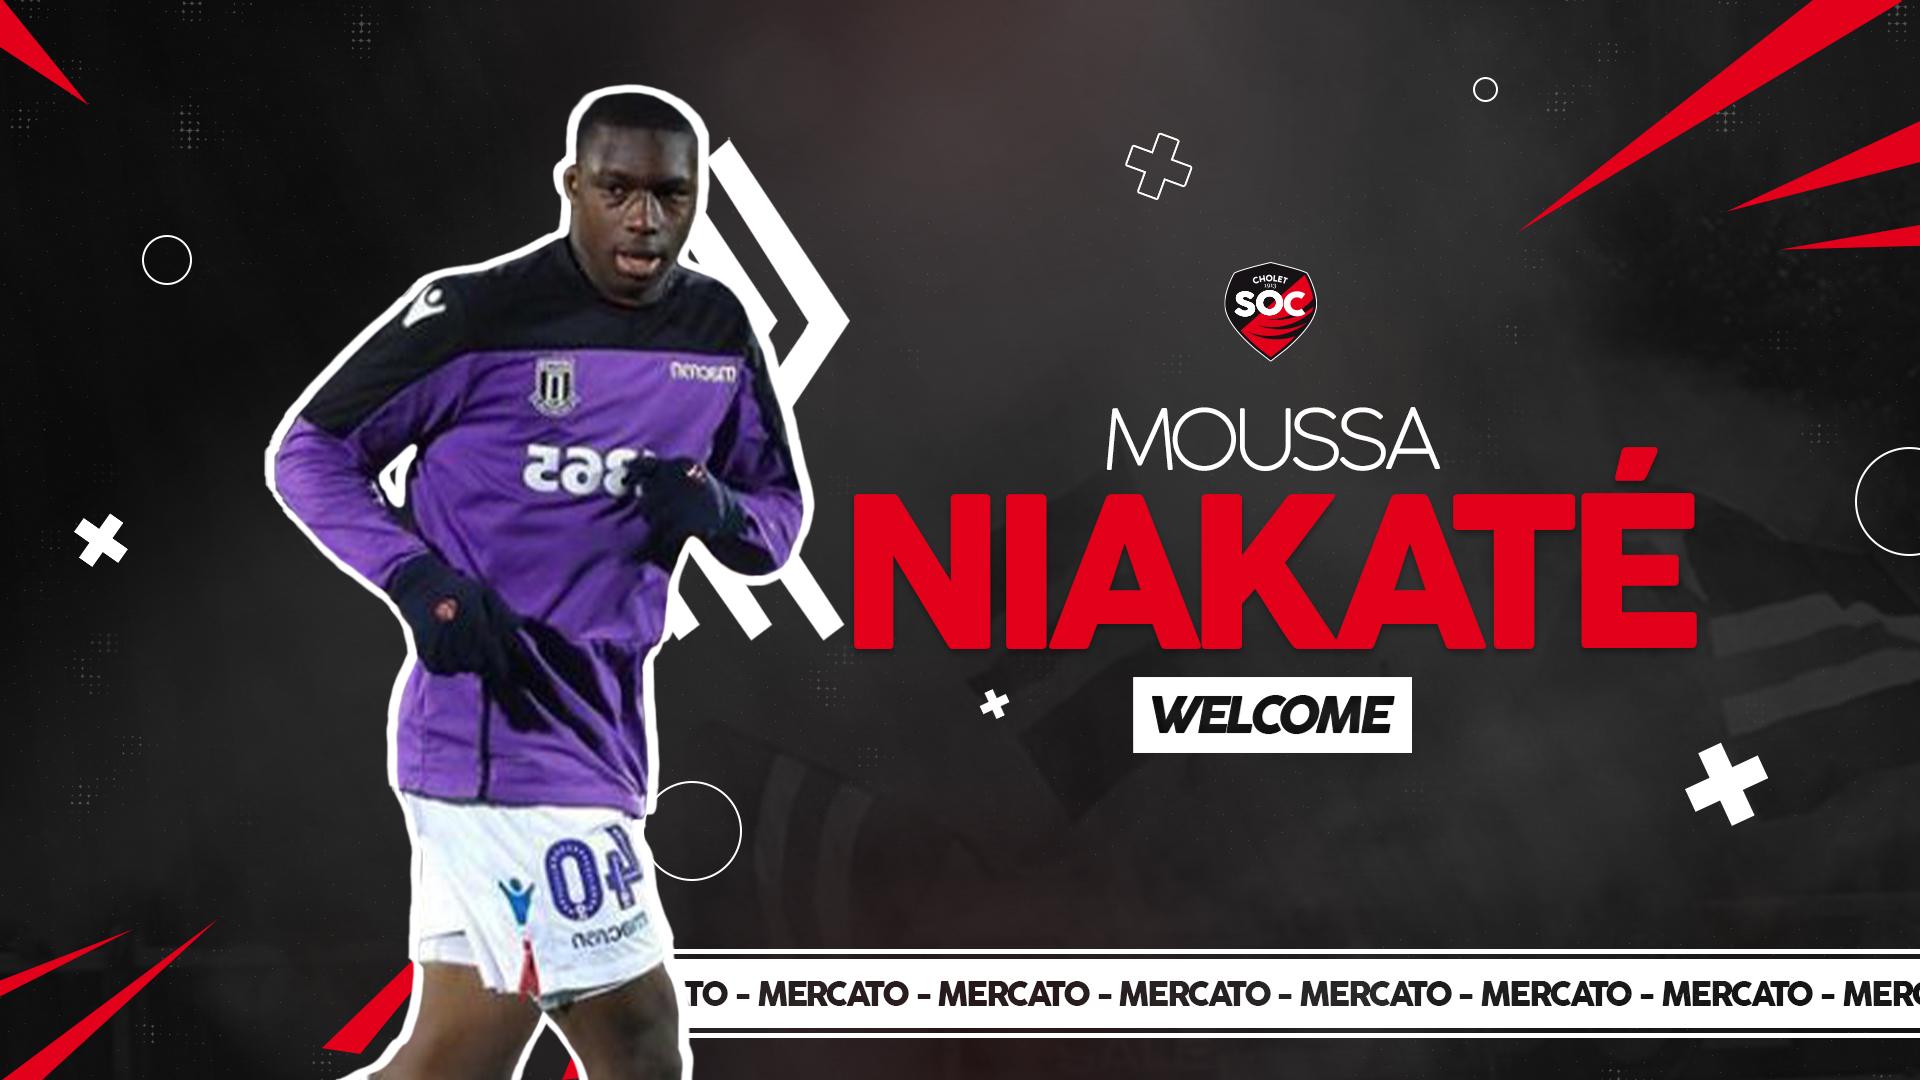 Moussa Niakatxx Recrutement